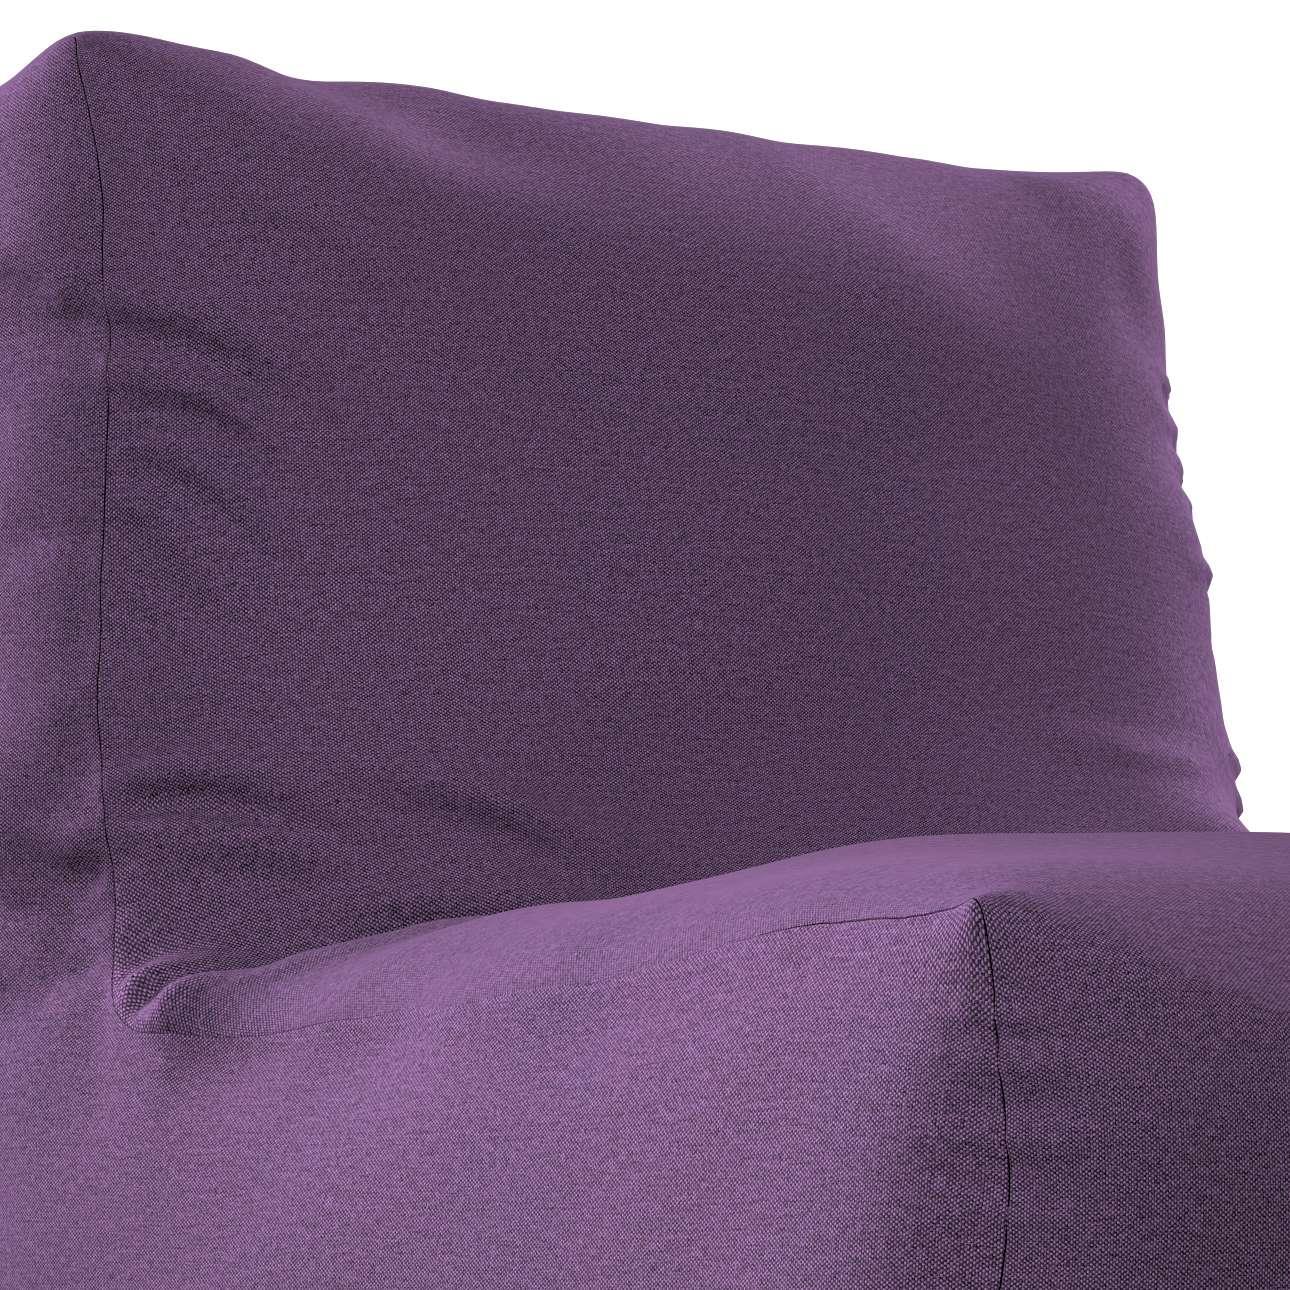 Pufa- fotel w kolekcji Etna, tkanina: 161-27